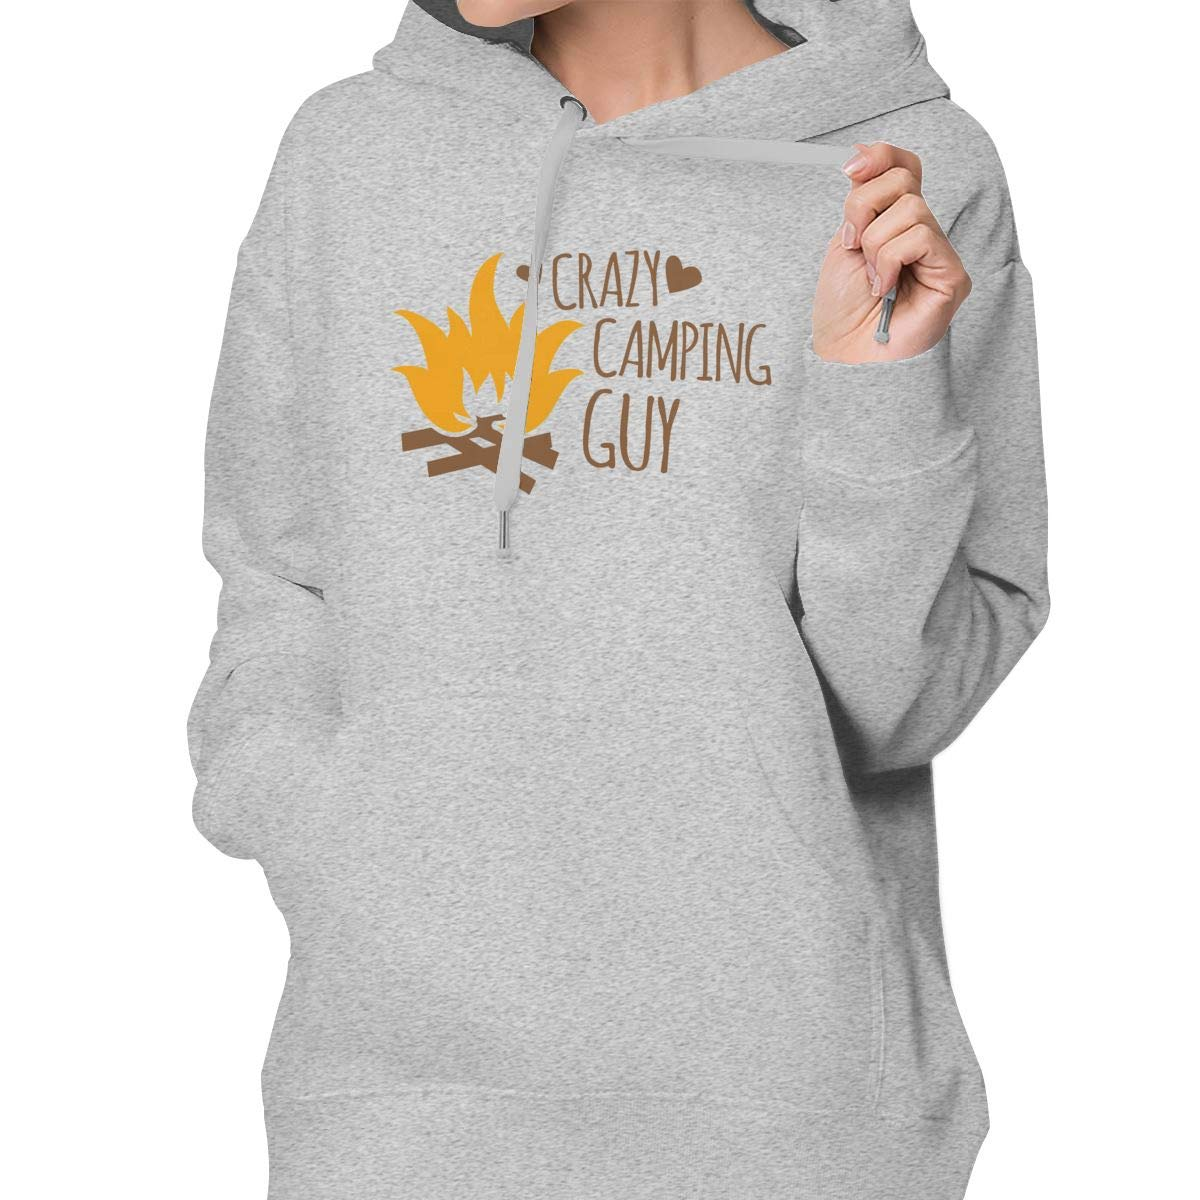 Sakanpo Crazy Camping Guy Womens Hoodie Sweatshirt with Pocket